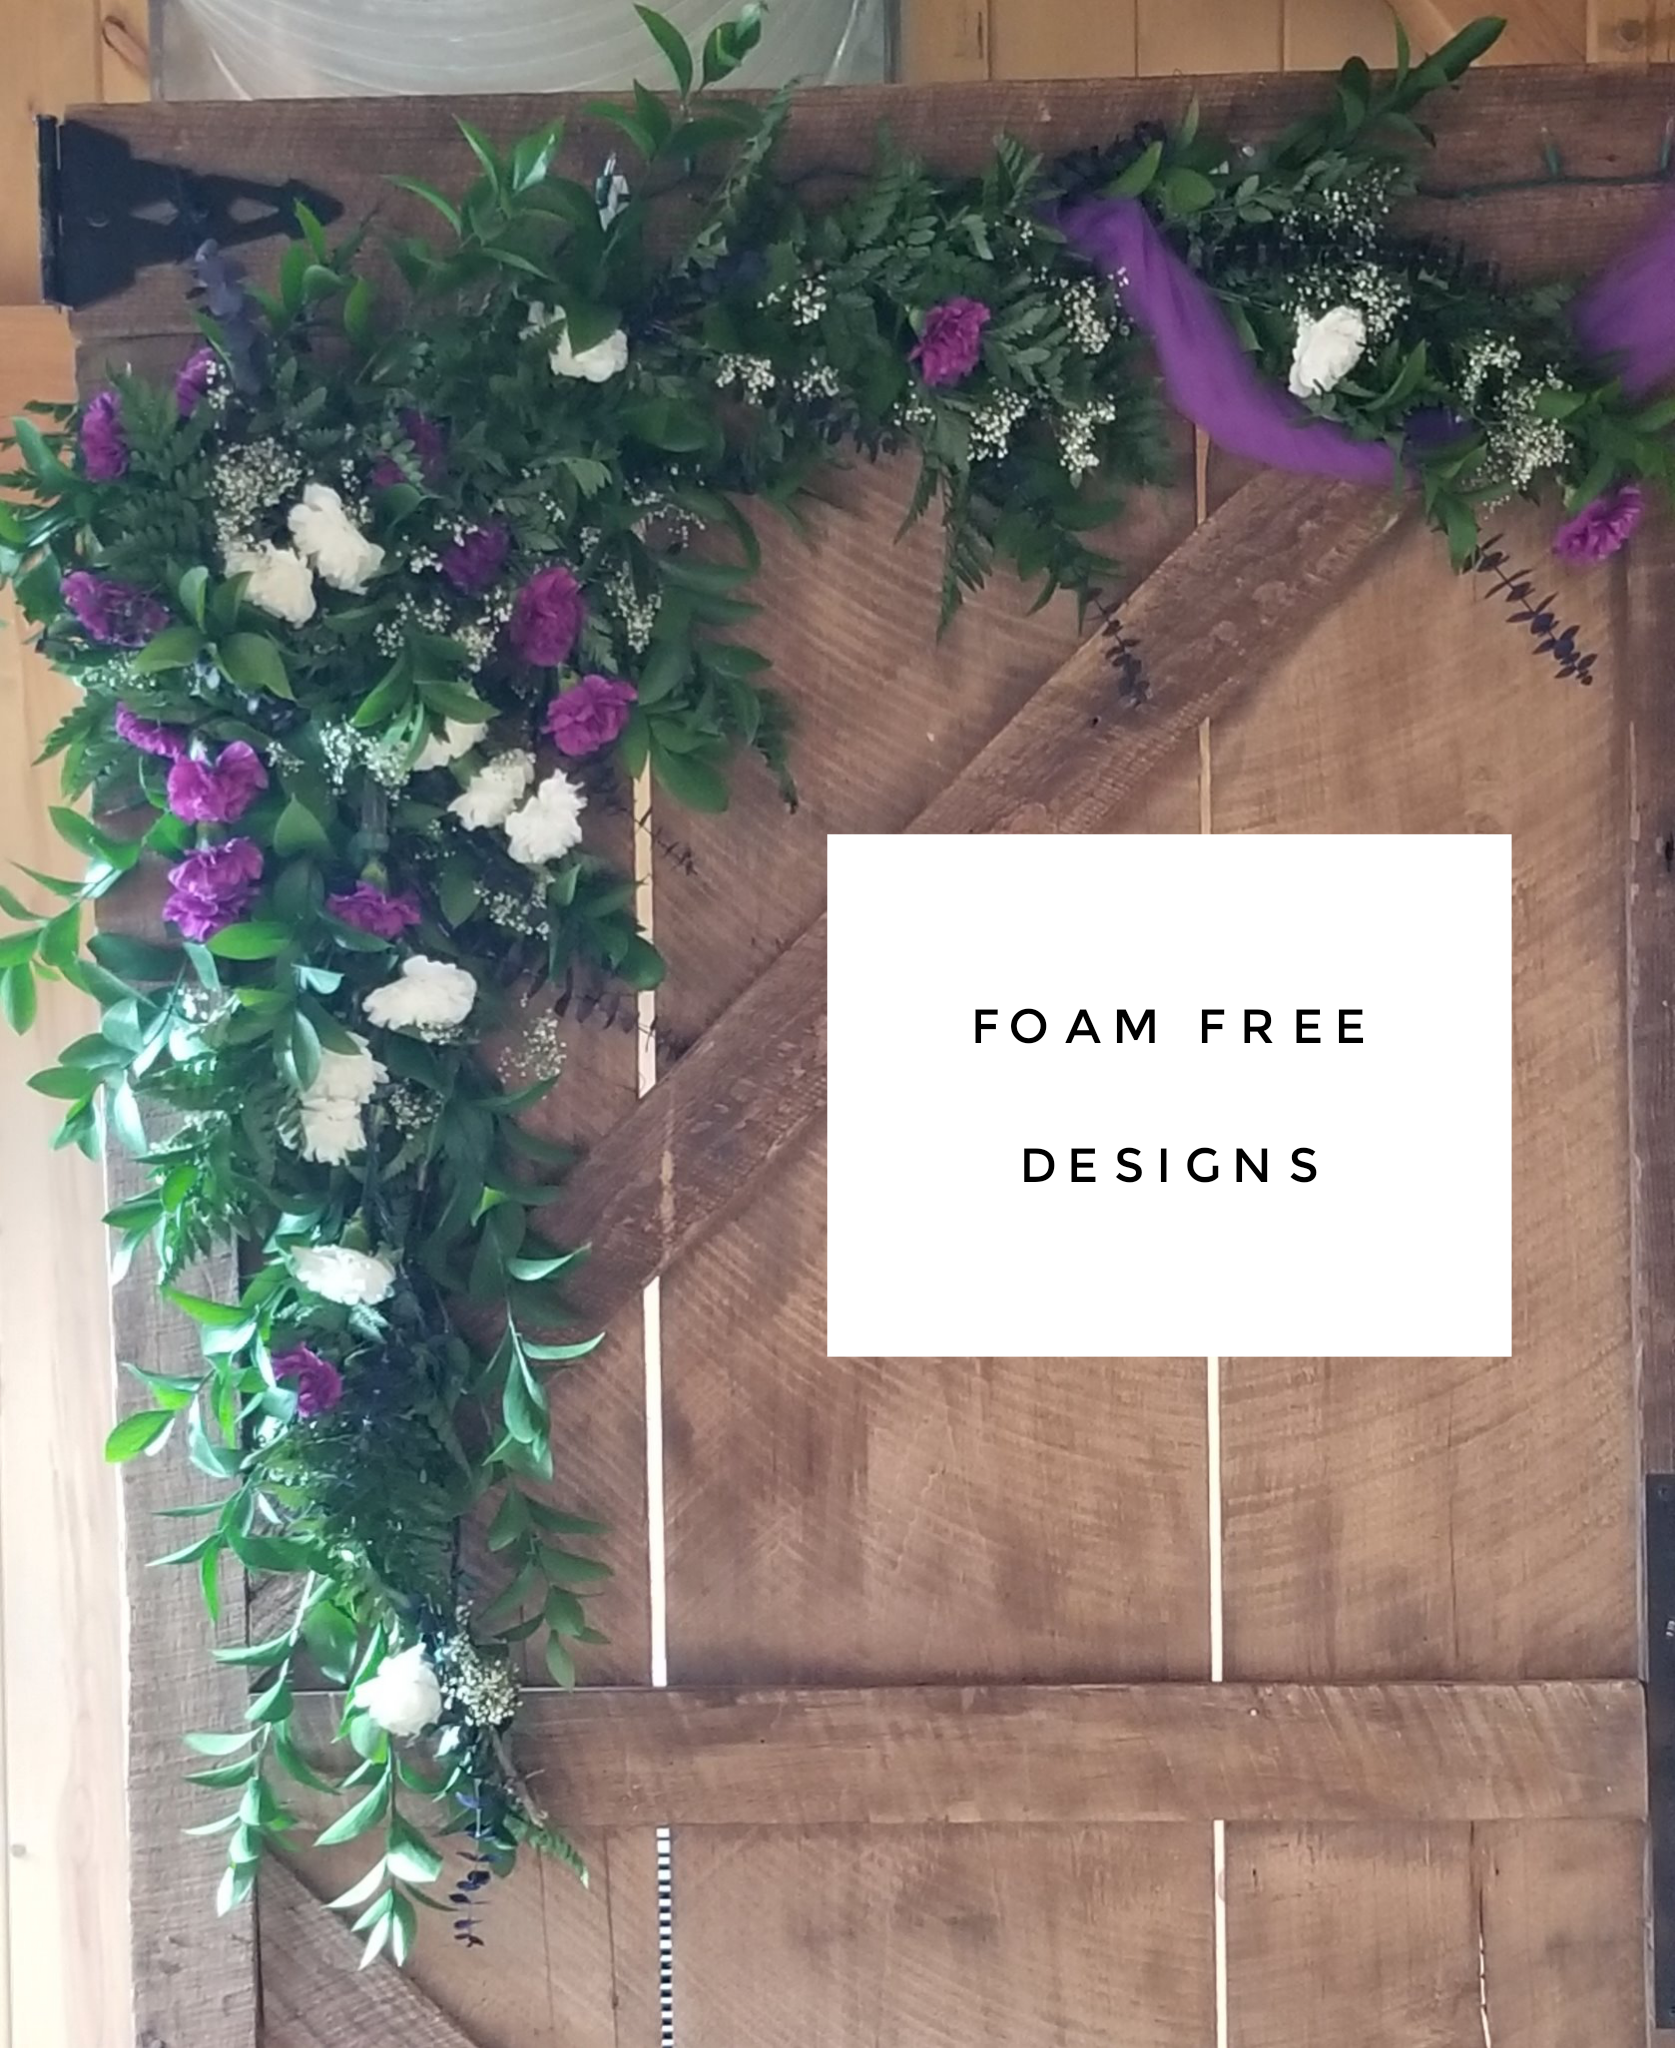 Foam free floral designs